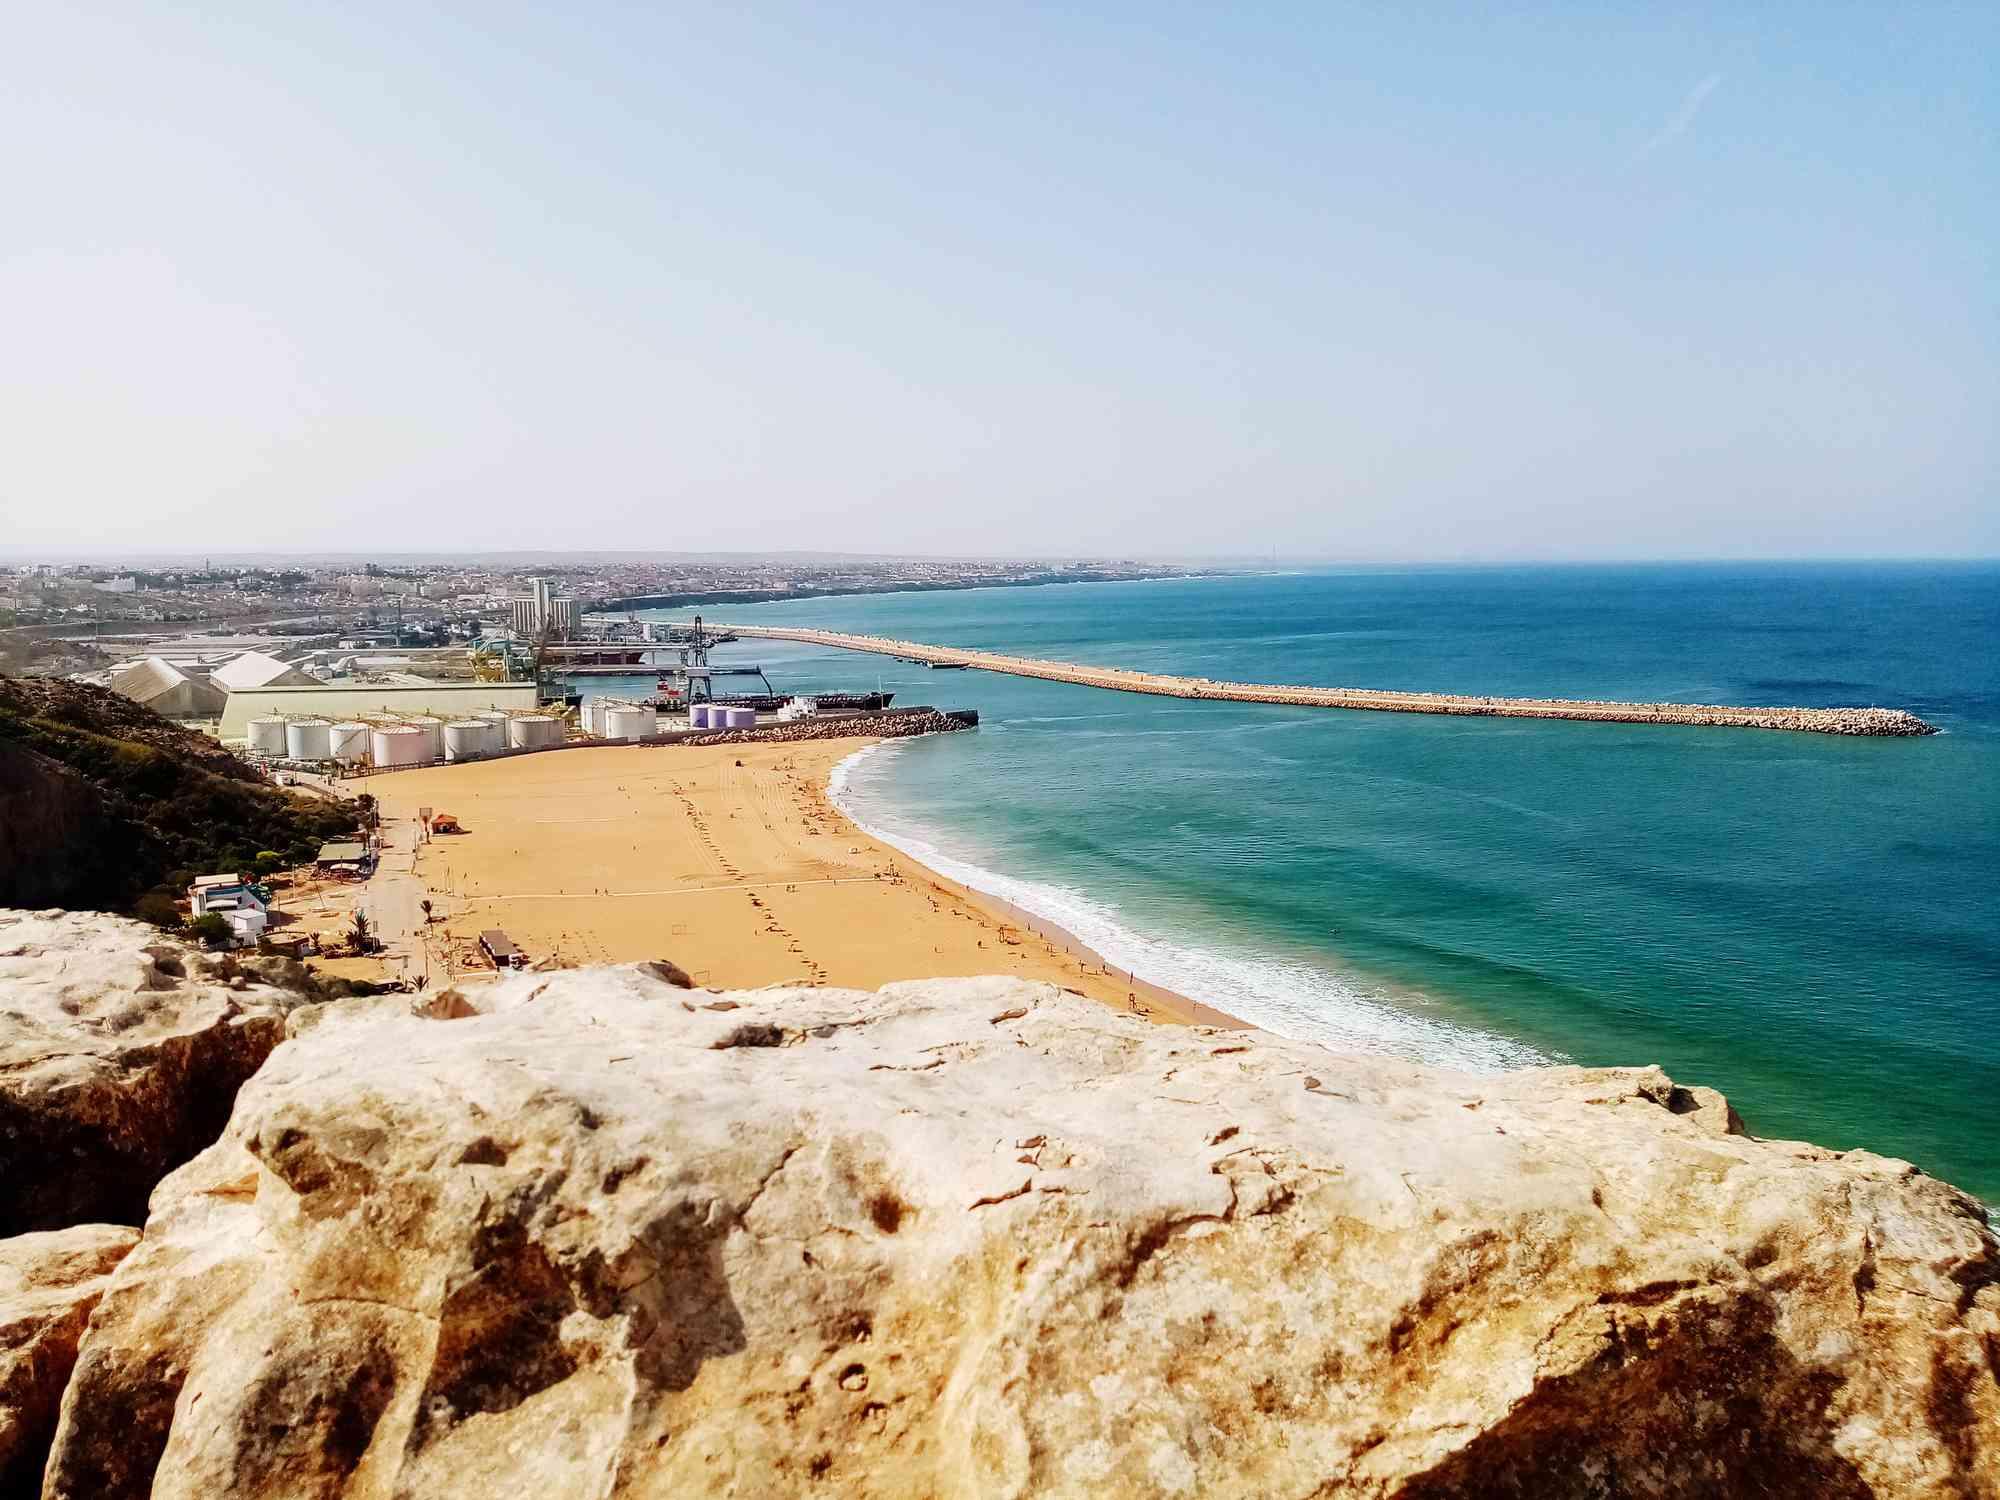 High angle view of Safi town and beach, Morocco